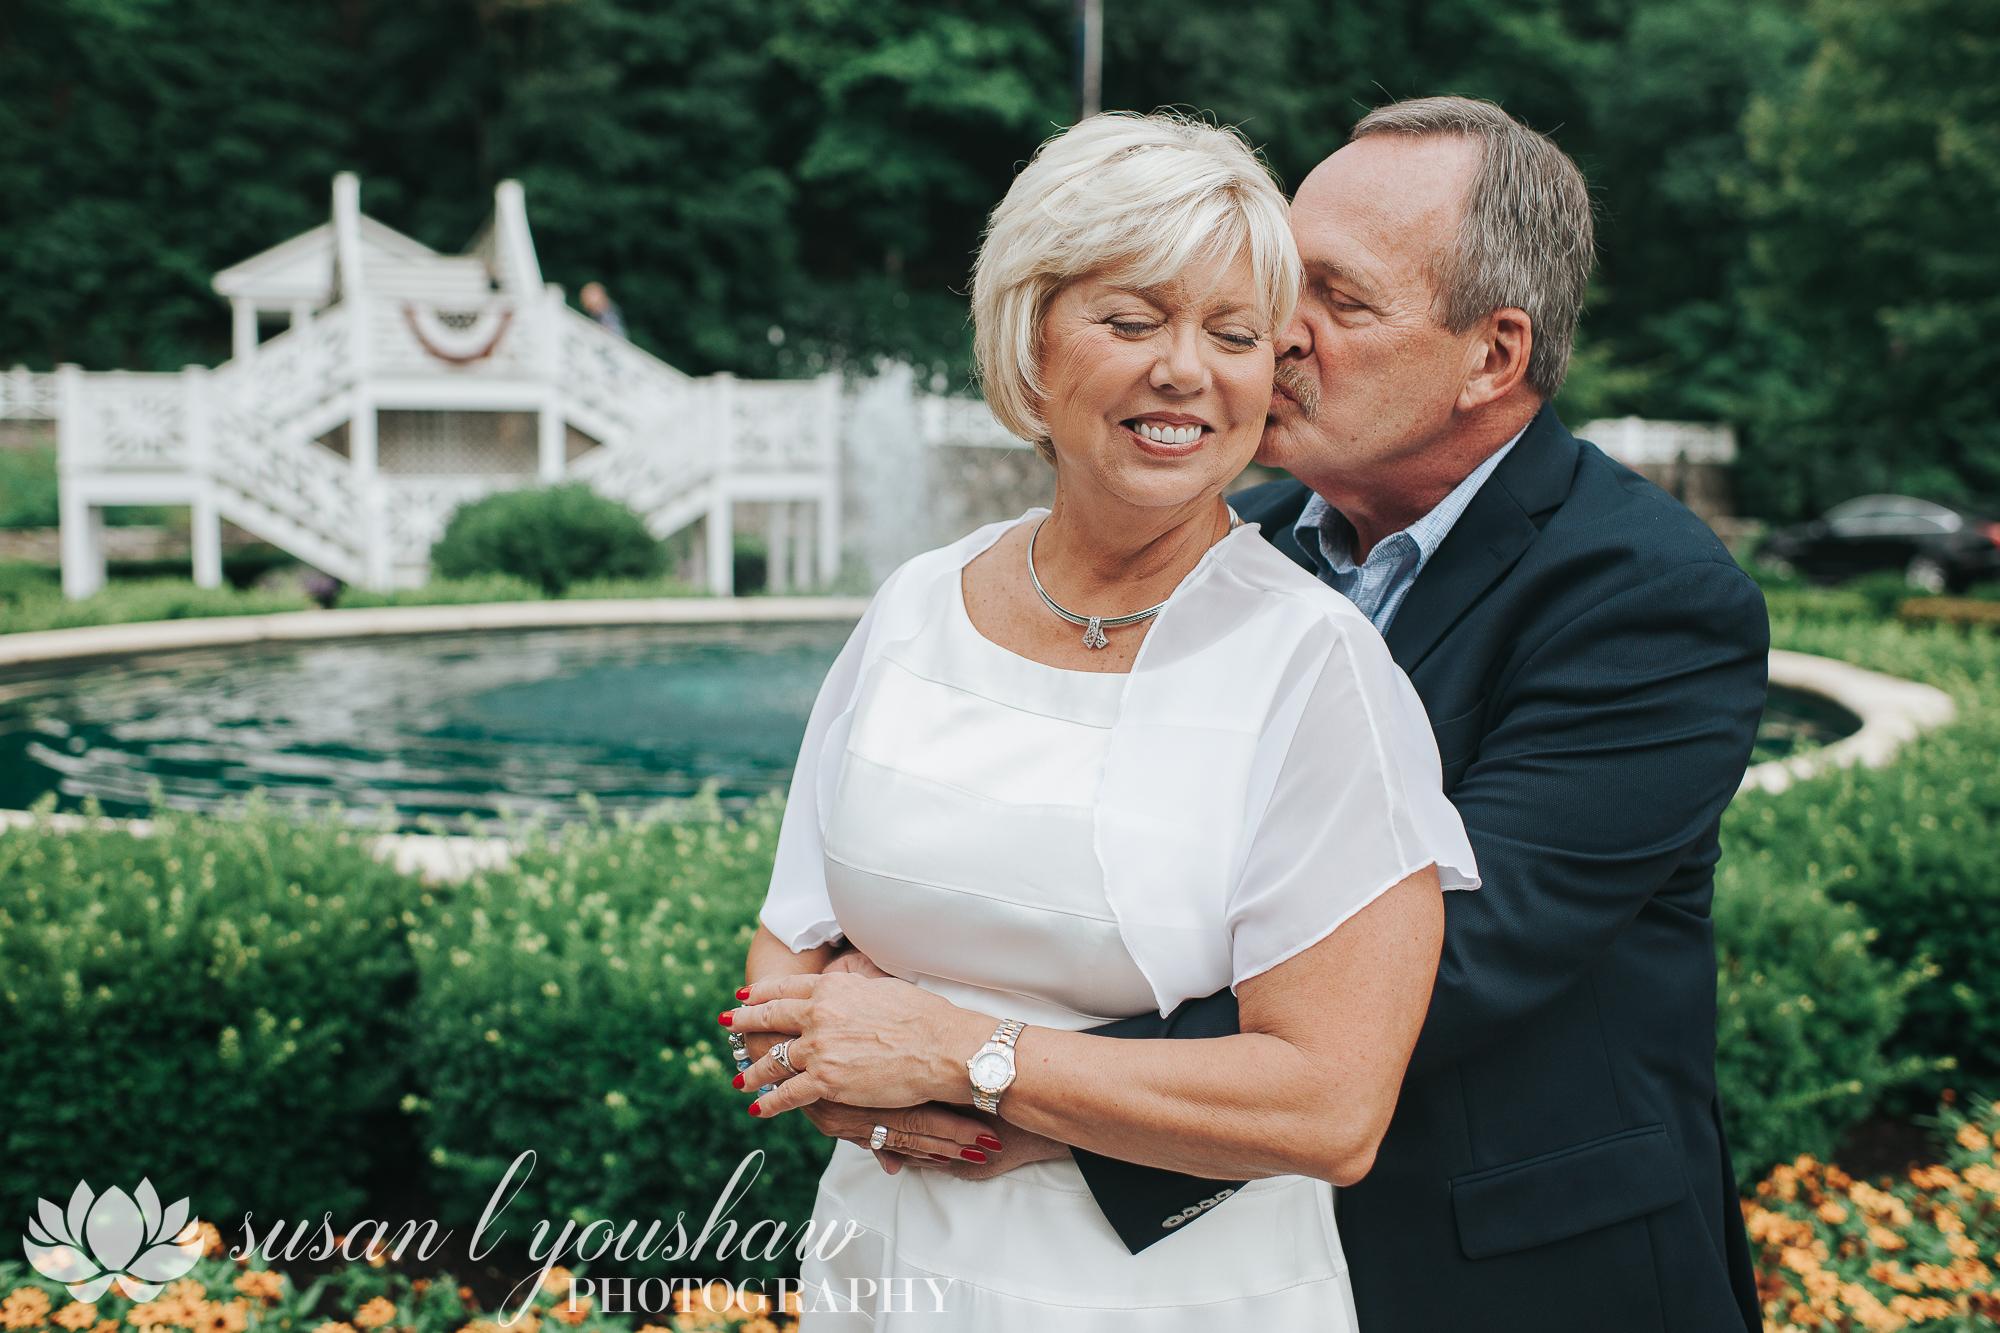 BLOG Carolyn Adams and Jim McCune 07-04-2018 SLY Photography-38.jpg